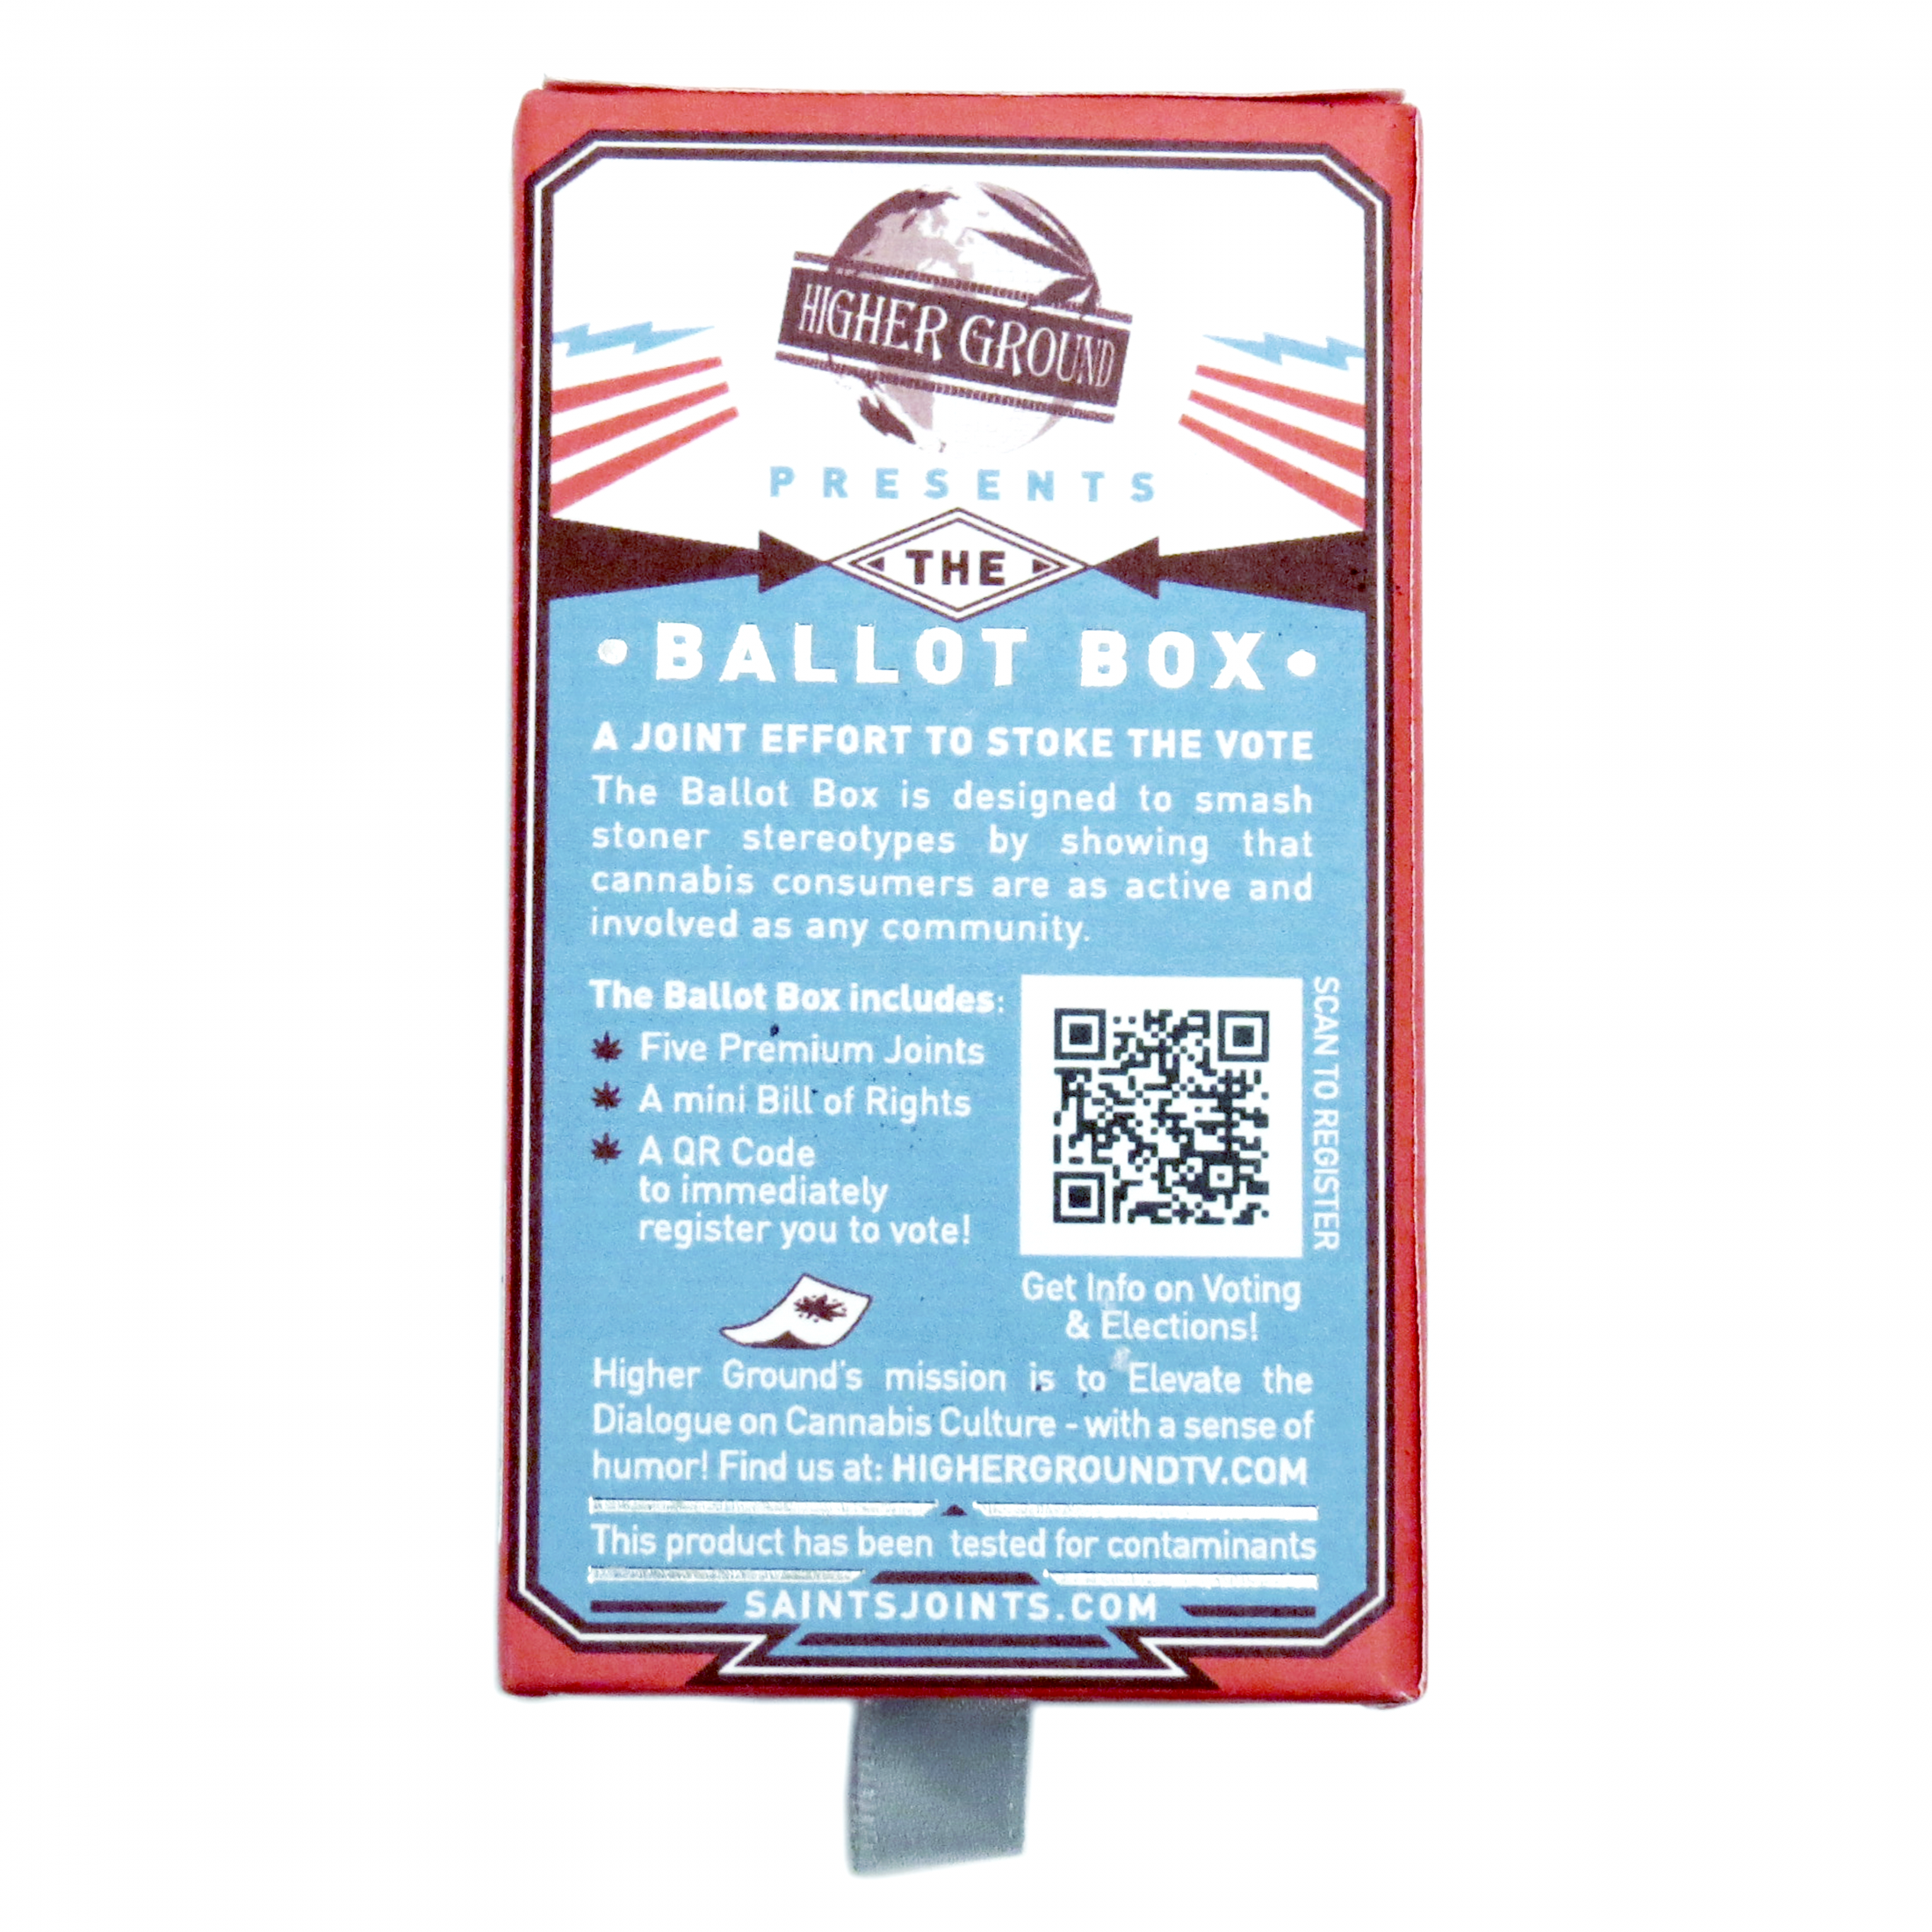 Saints: The Ballot Box